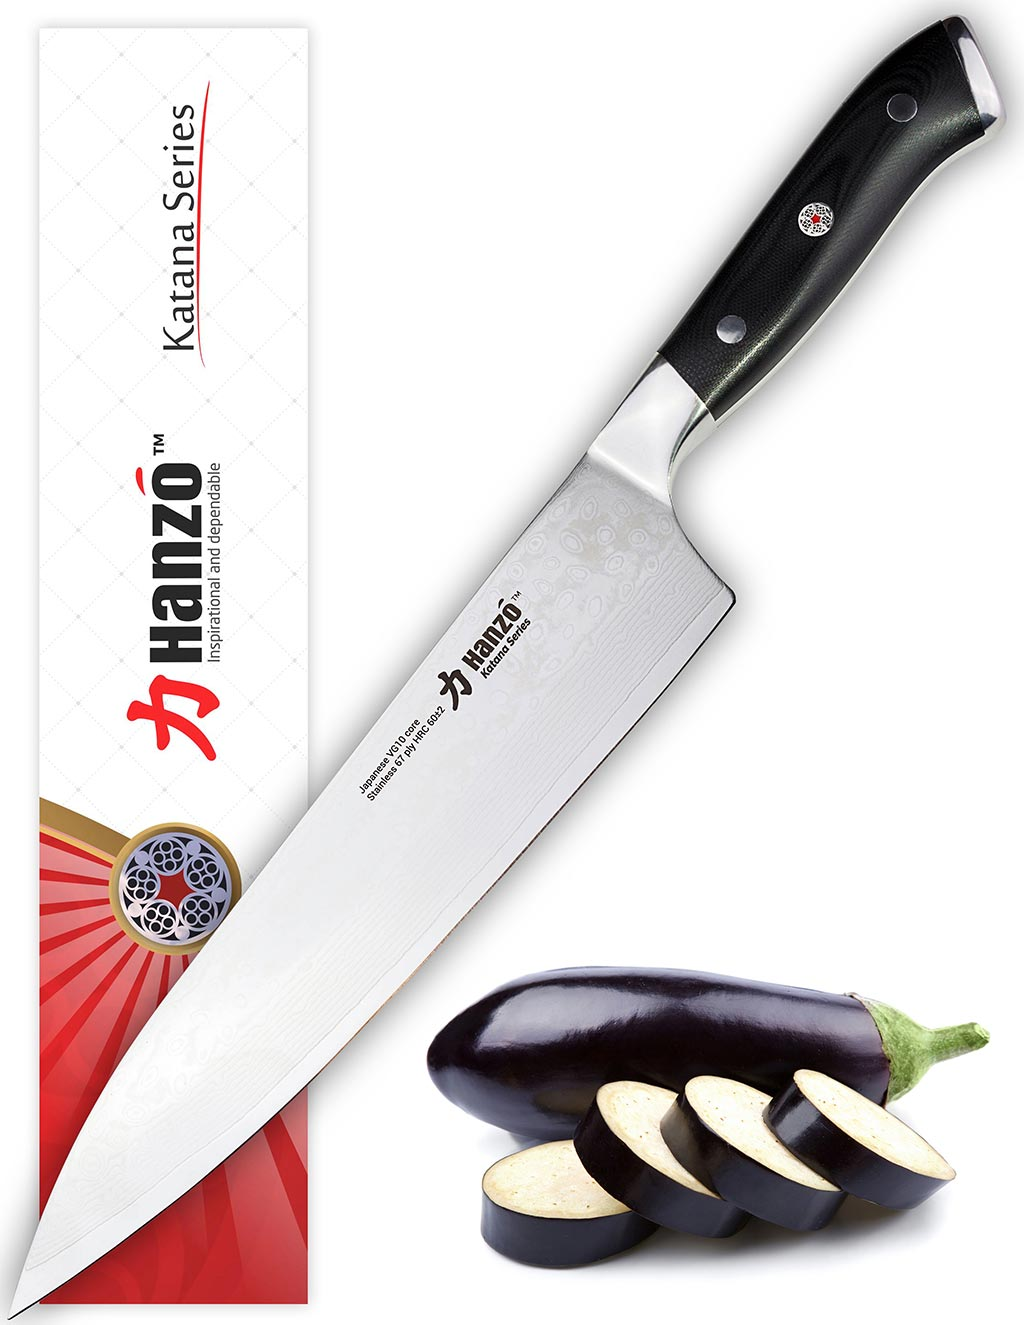 Hanzo Katana Chef knife